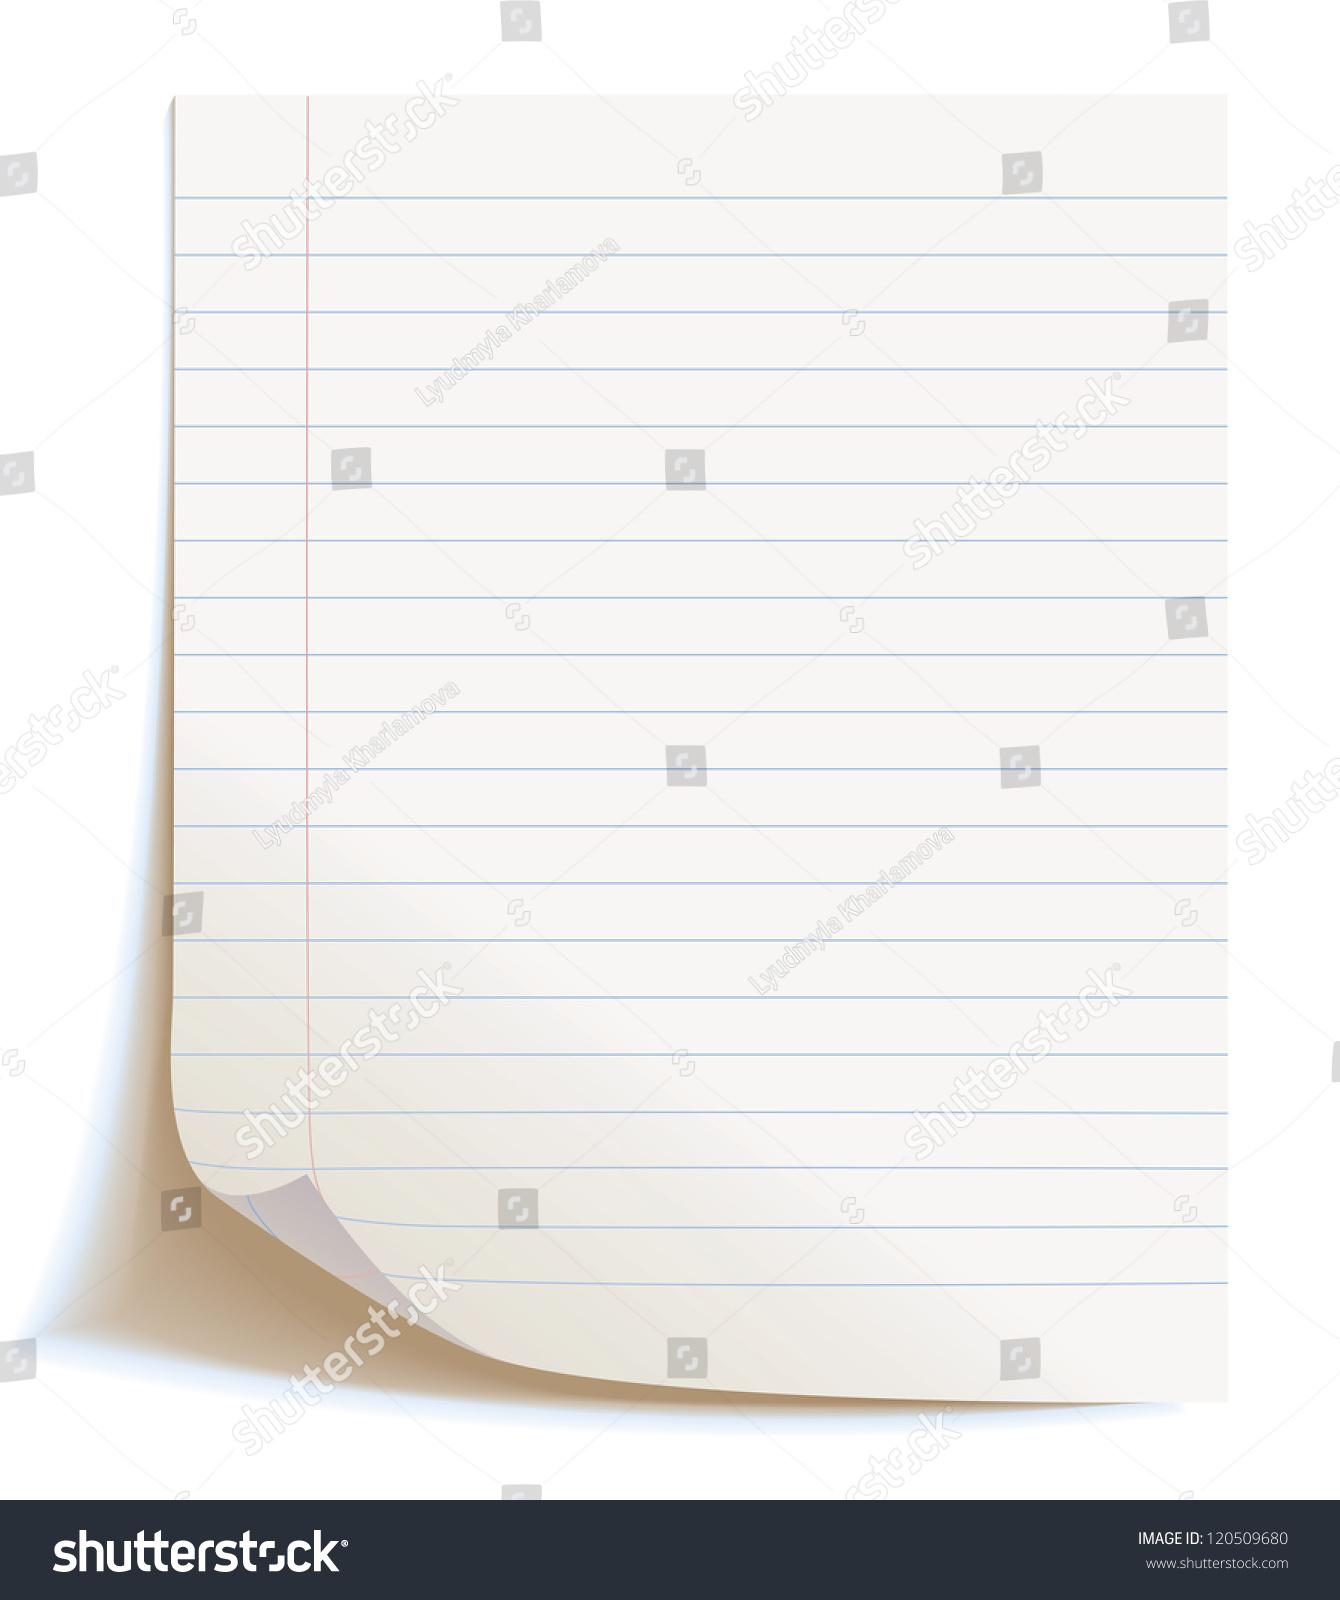 Worksheet Background Image